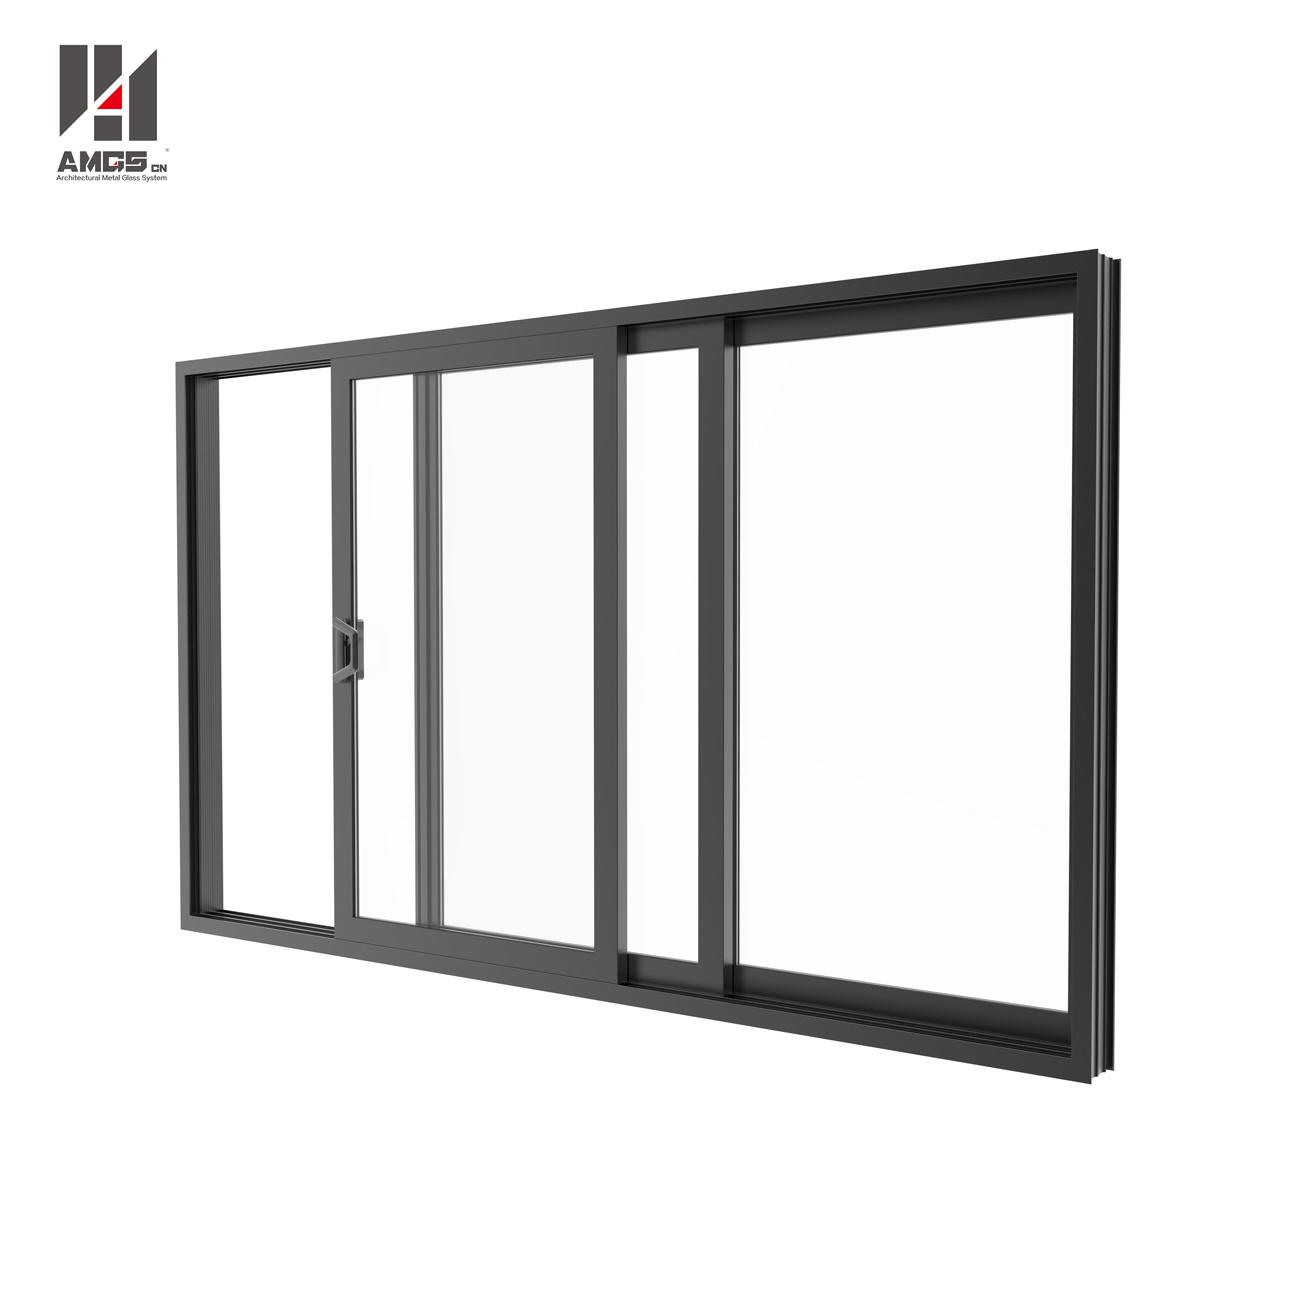 Modern Latest Design Doors Windows Price of Aluminum Sliding Window with Mosquito Net